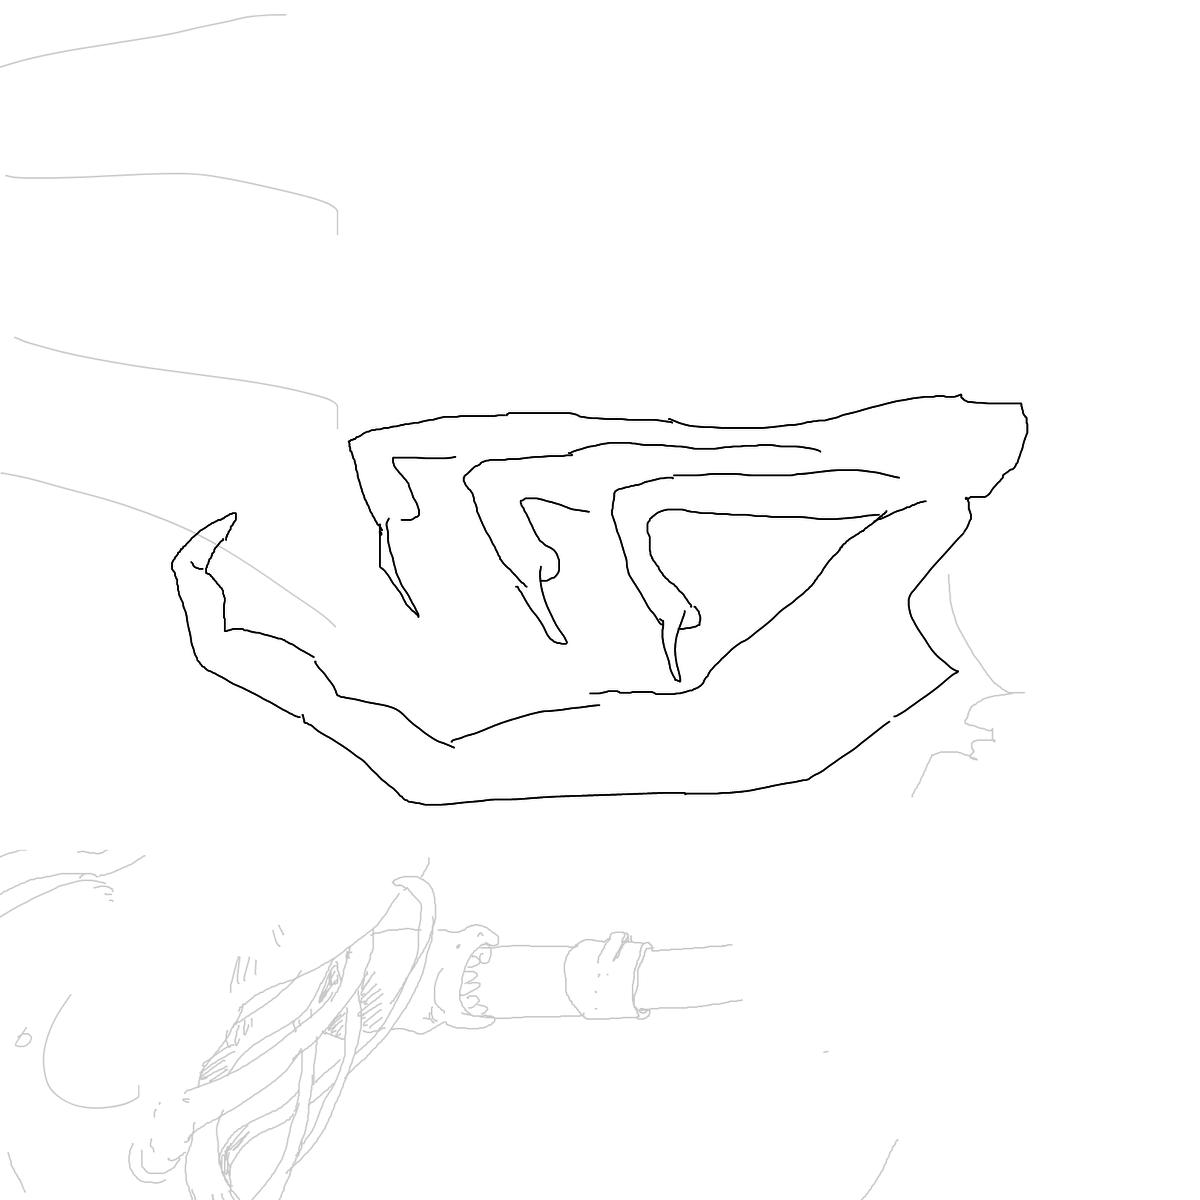 BAAAM drawing#23922 lat:78.4174652099609400lng: -4.4292459487915040